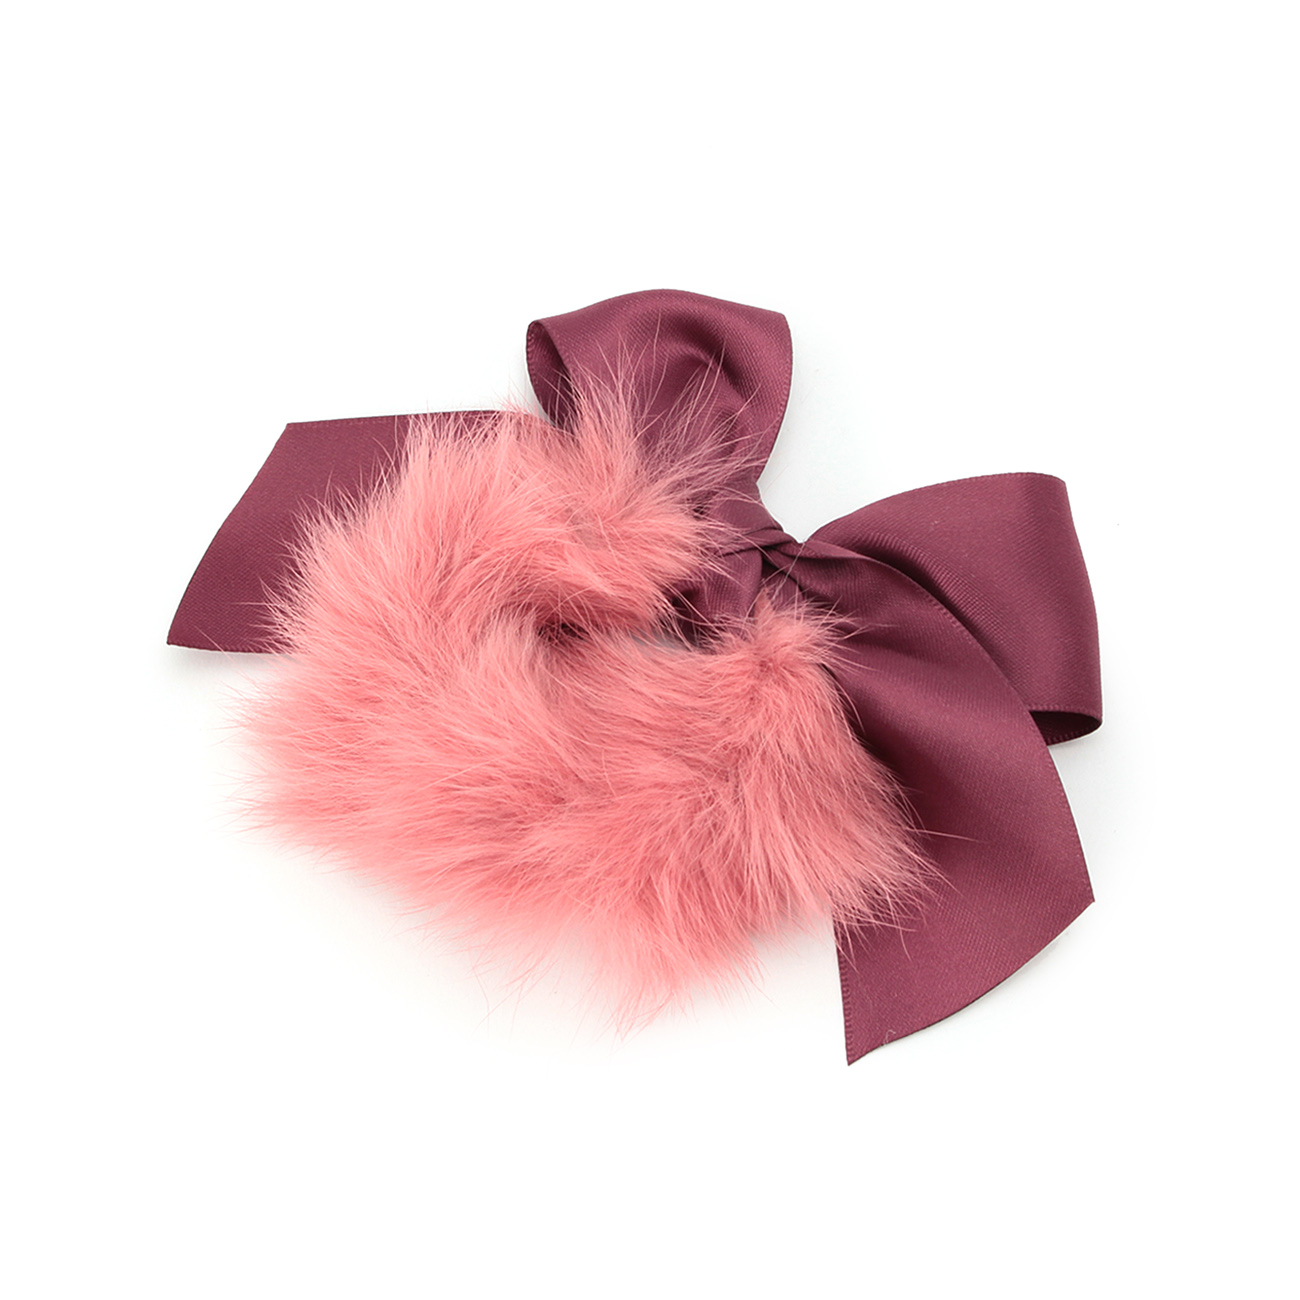 【Couture brooch (クチュールブローチ)】ファーリボンヘアゴムレディース ヘアアクセサリー ヘアゴム・シュシュ ピンク